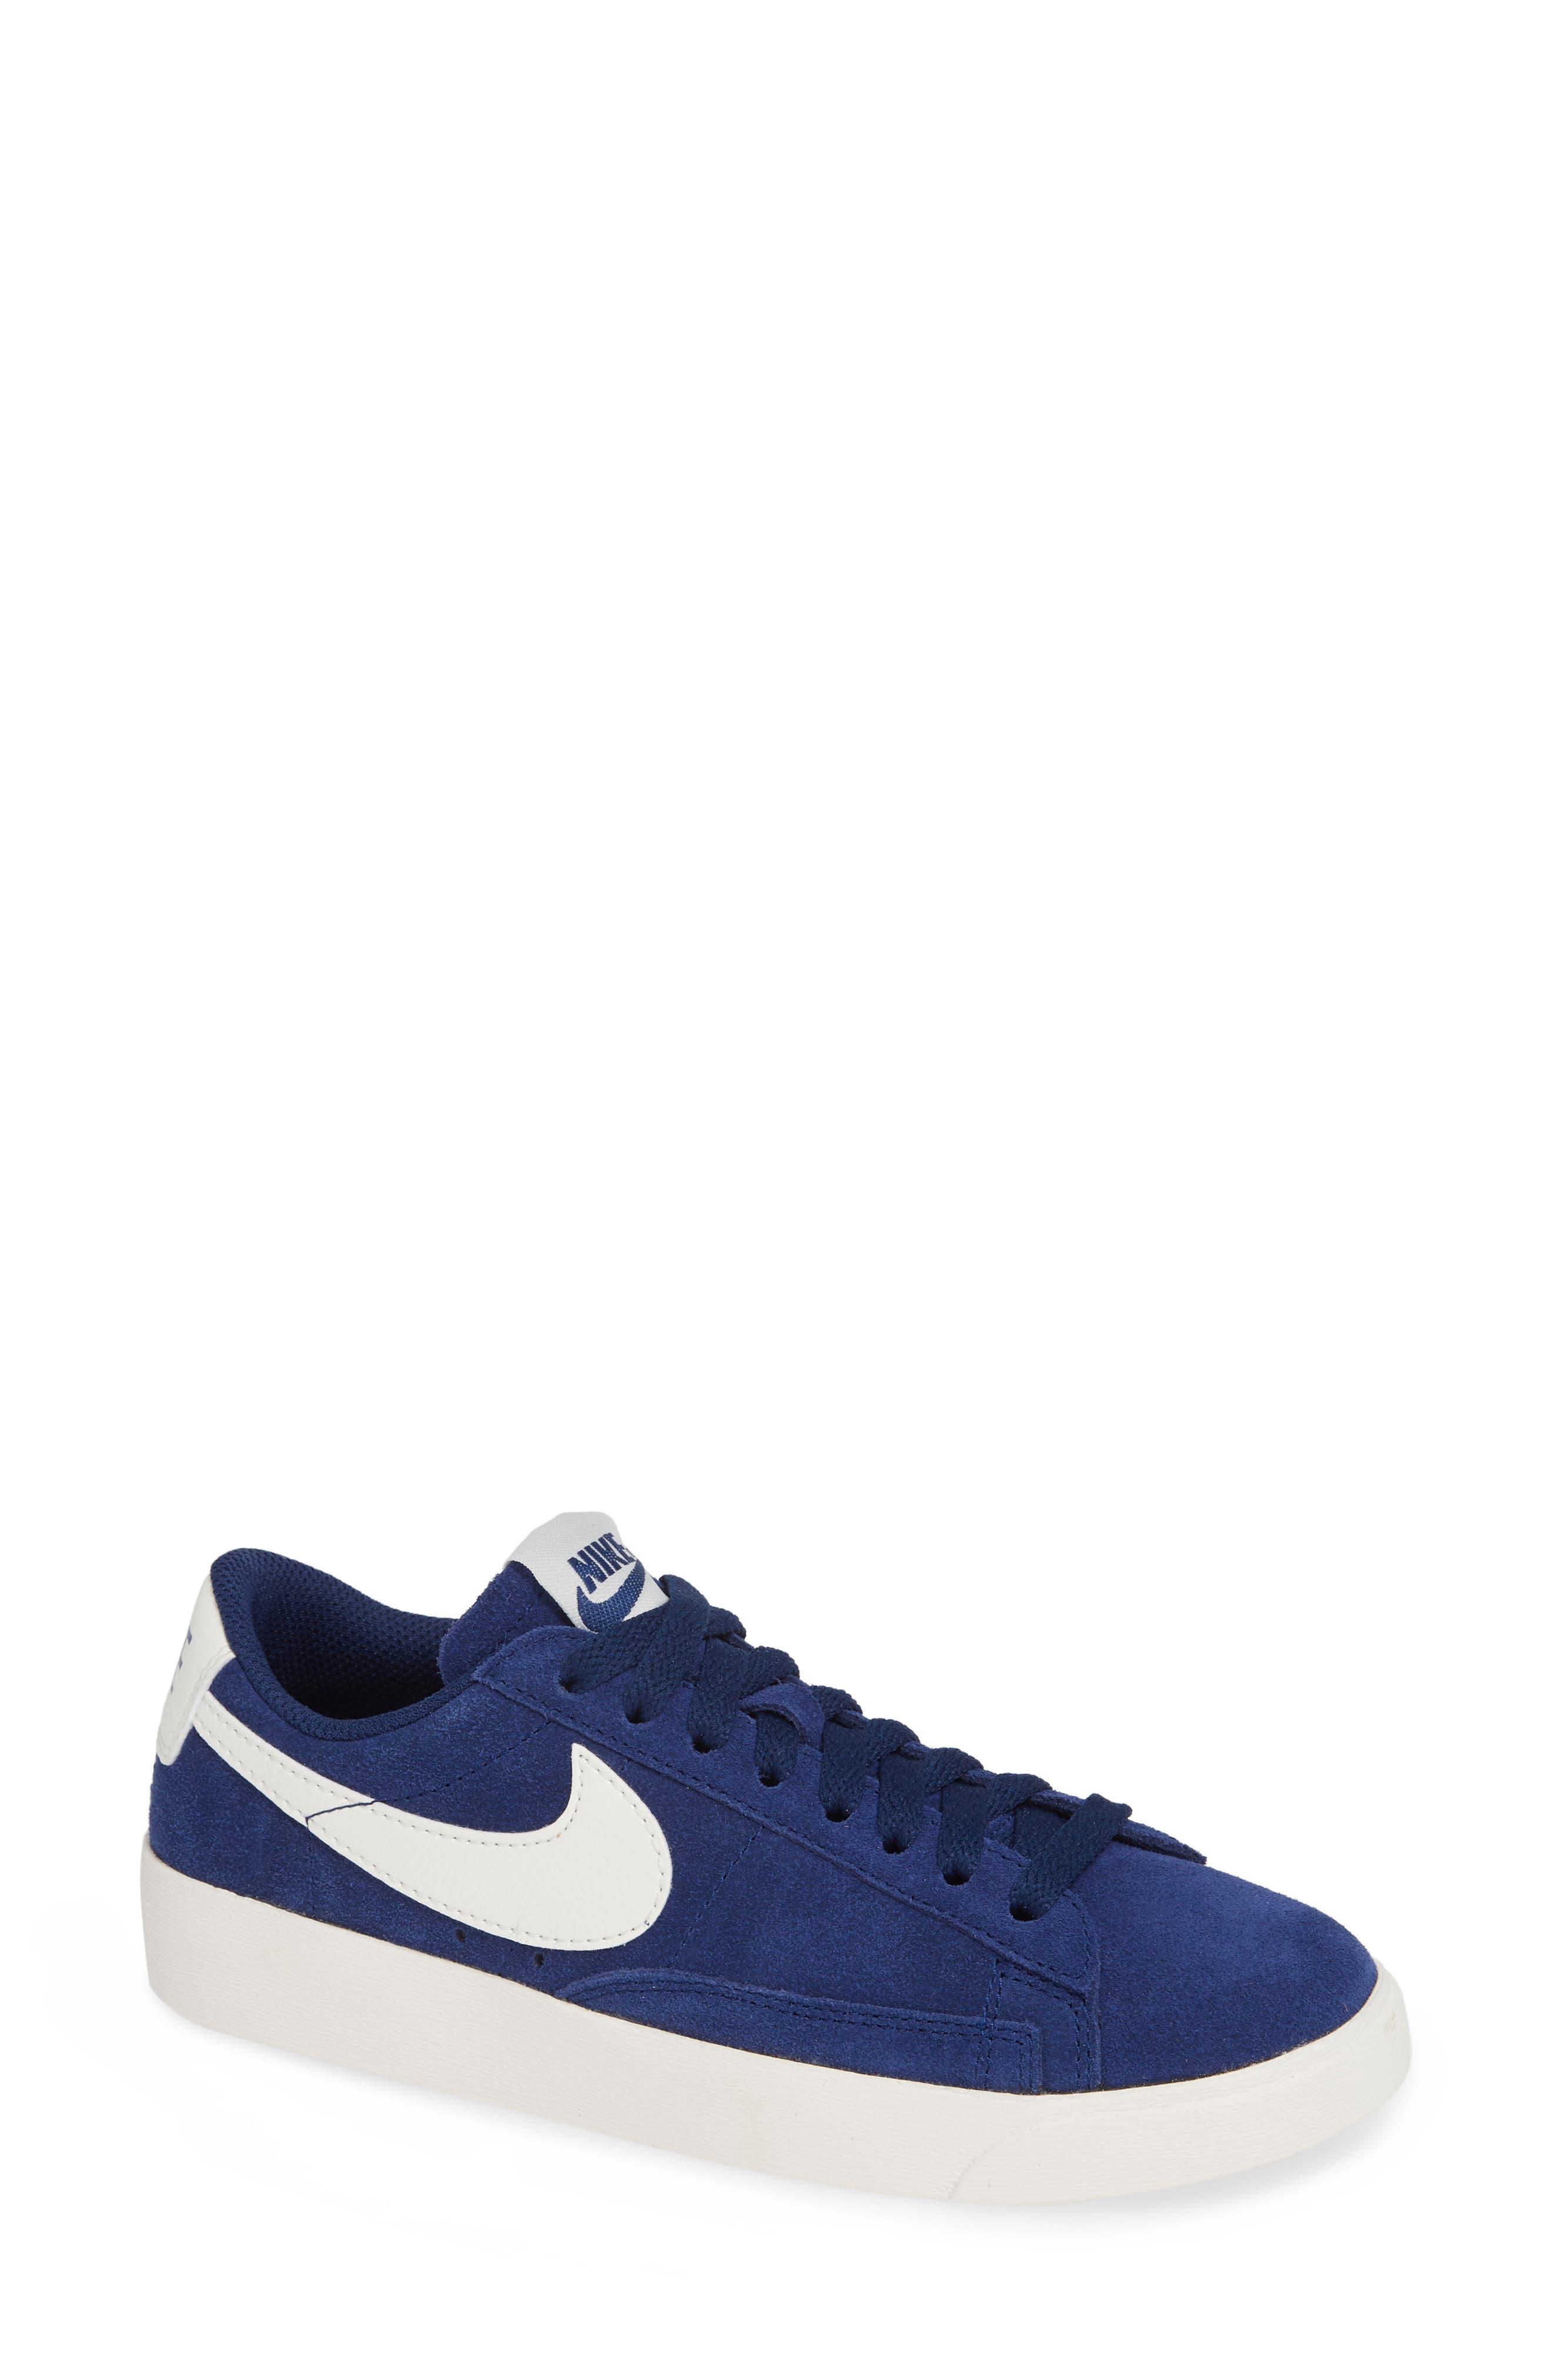 Blazer Low Sneaker,                             Main thumbnail 1, color,                             402